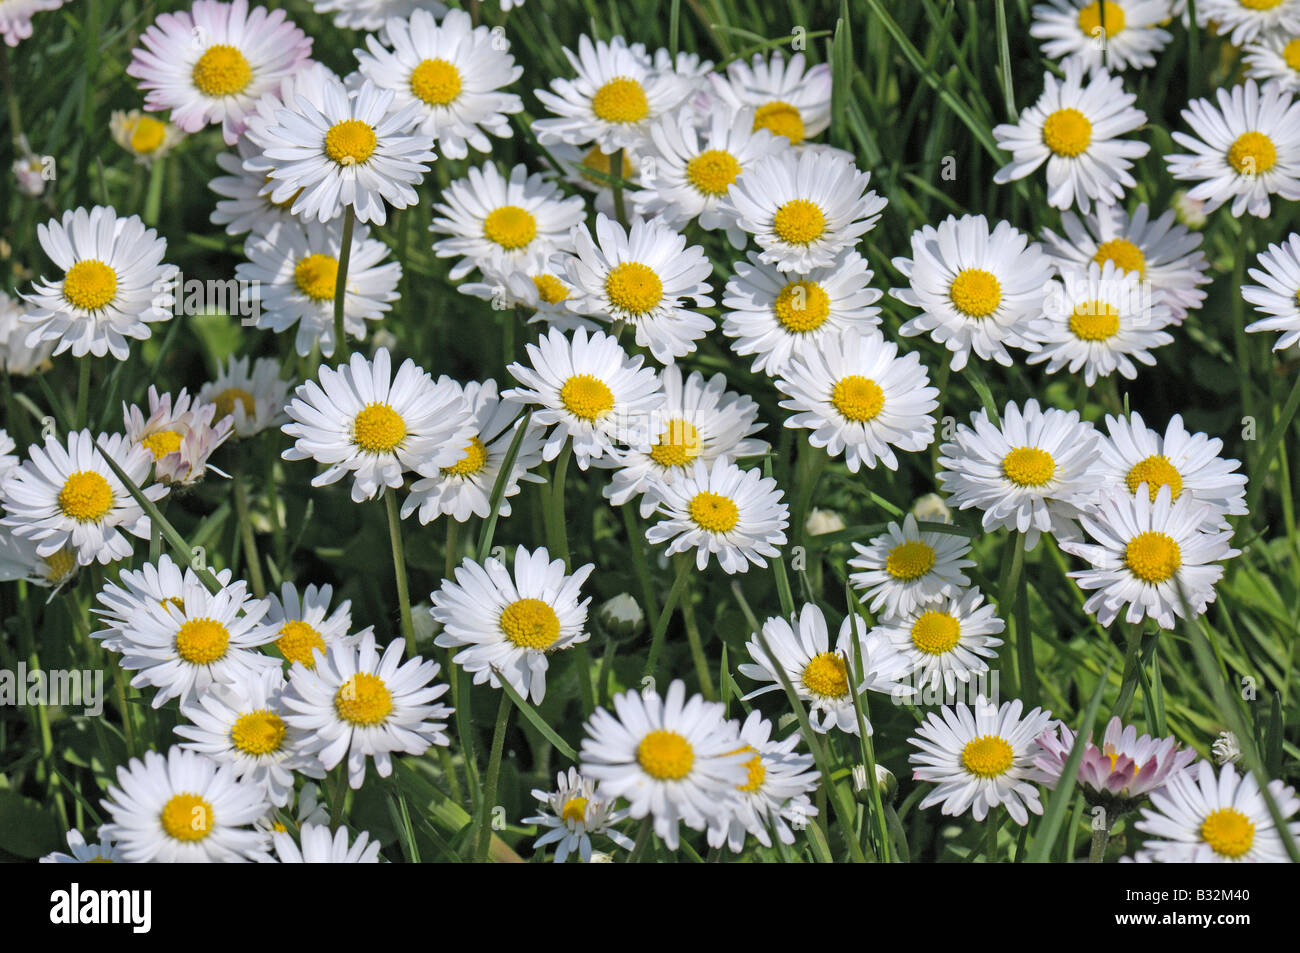 Bellis perennis flowers stock photos bellis perennis flowers stock common daisy english daisy meadow daisy bellis perennis flowers stock izmirmasajfo